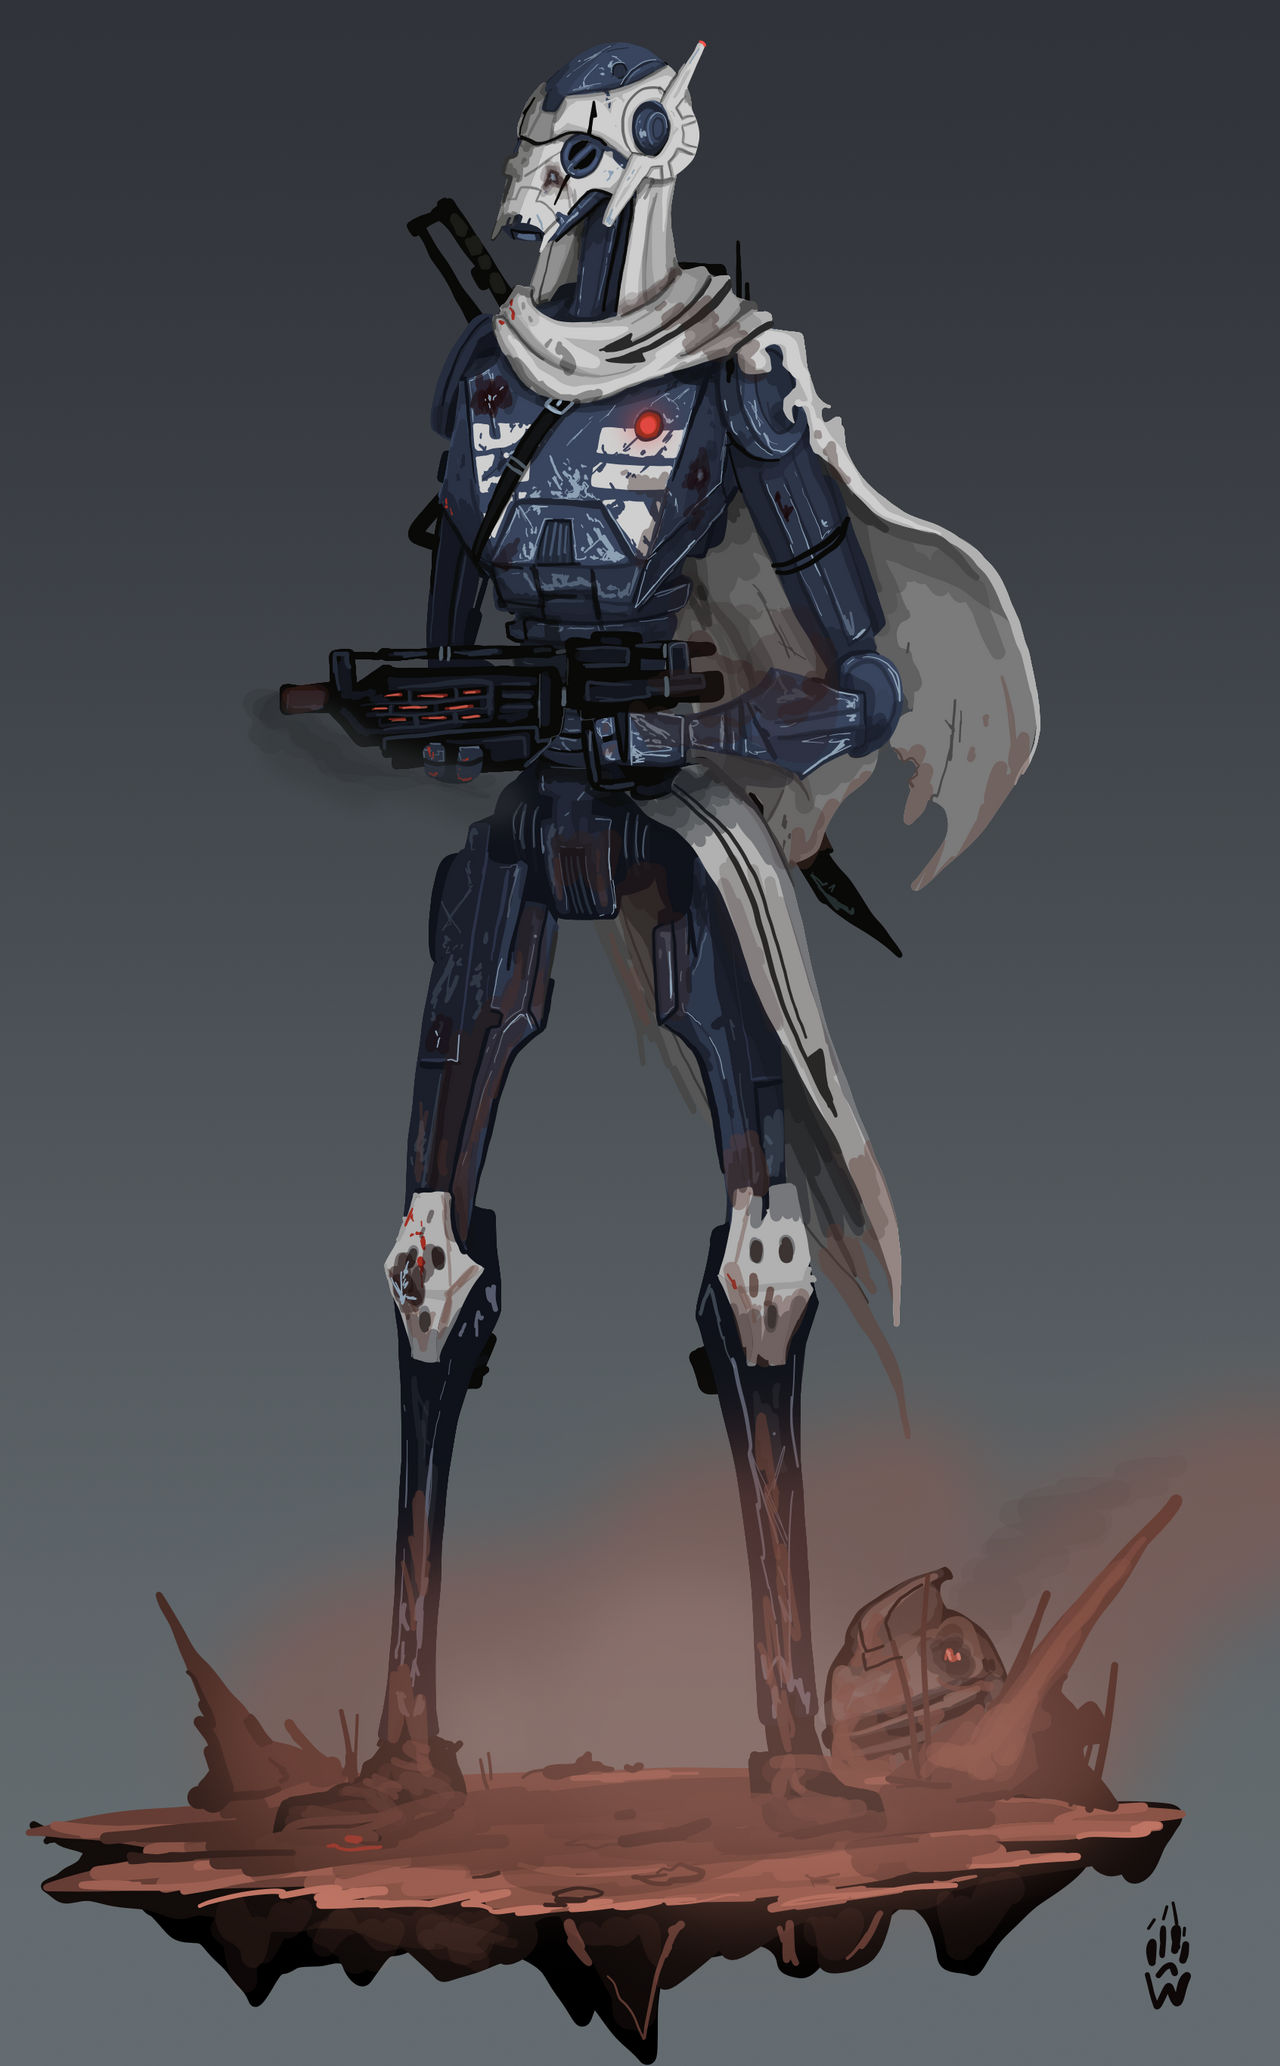 Grievous S Shock Trooper Commando Concept By Wolfdog